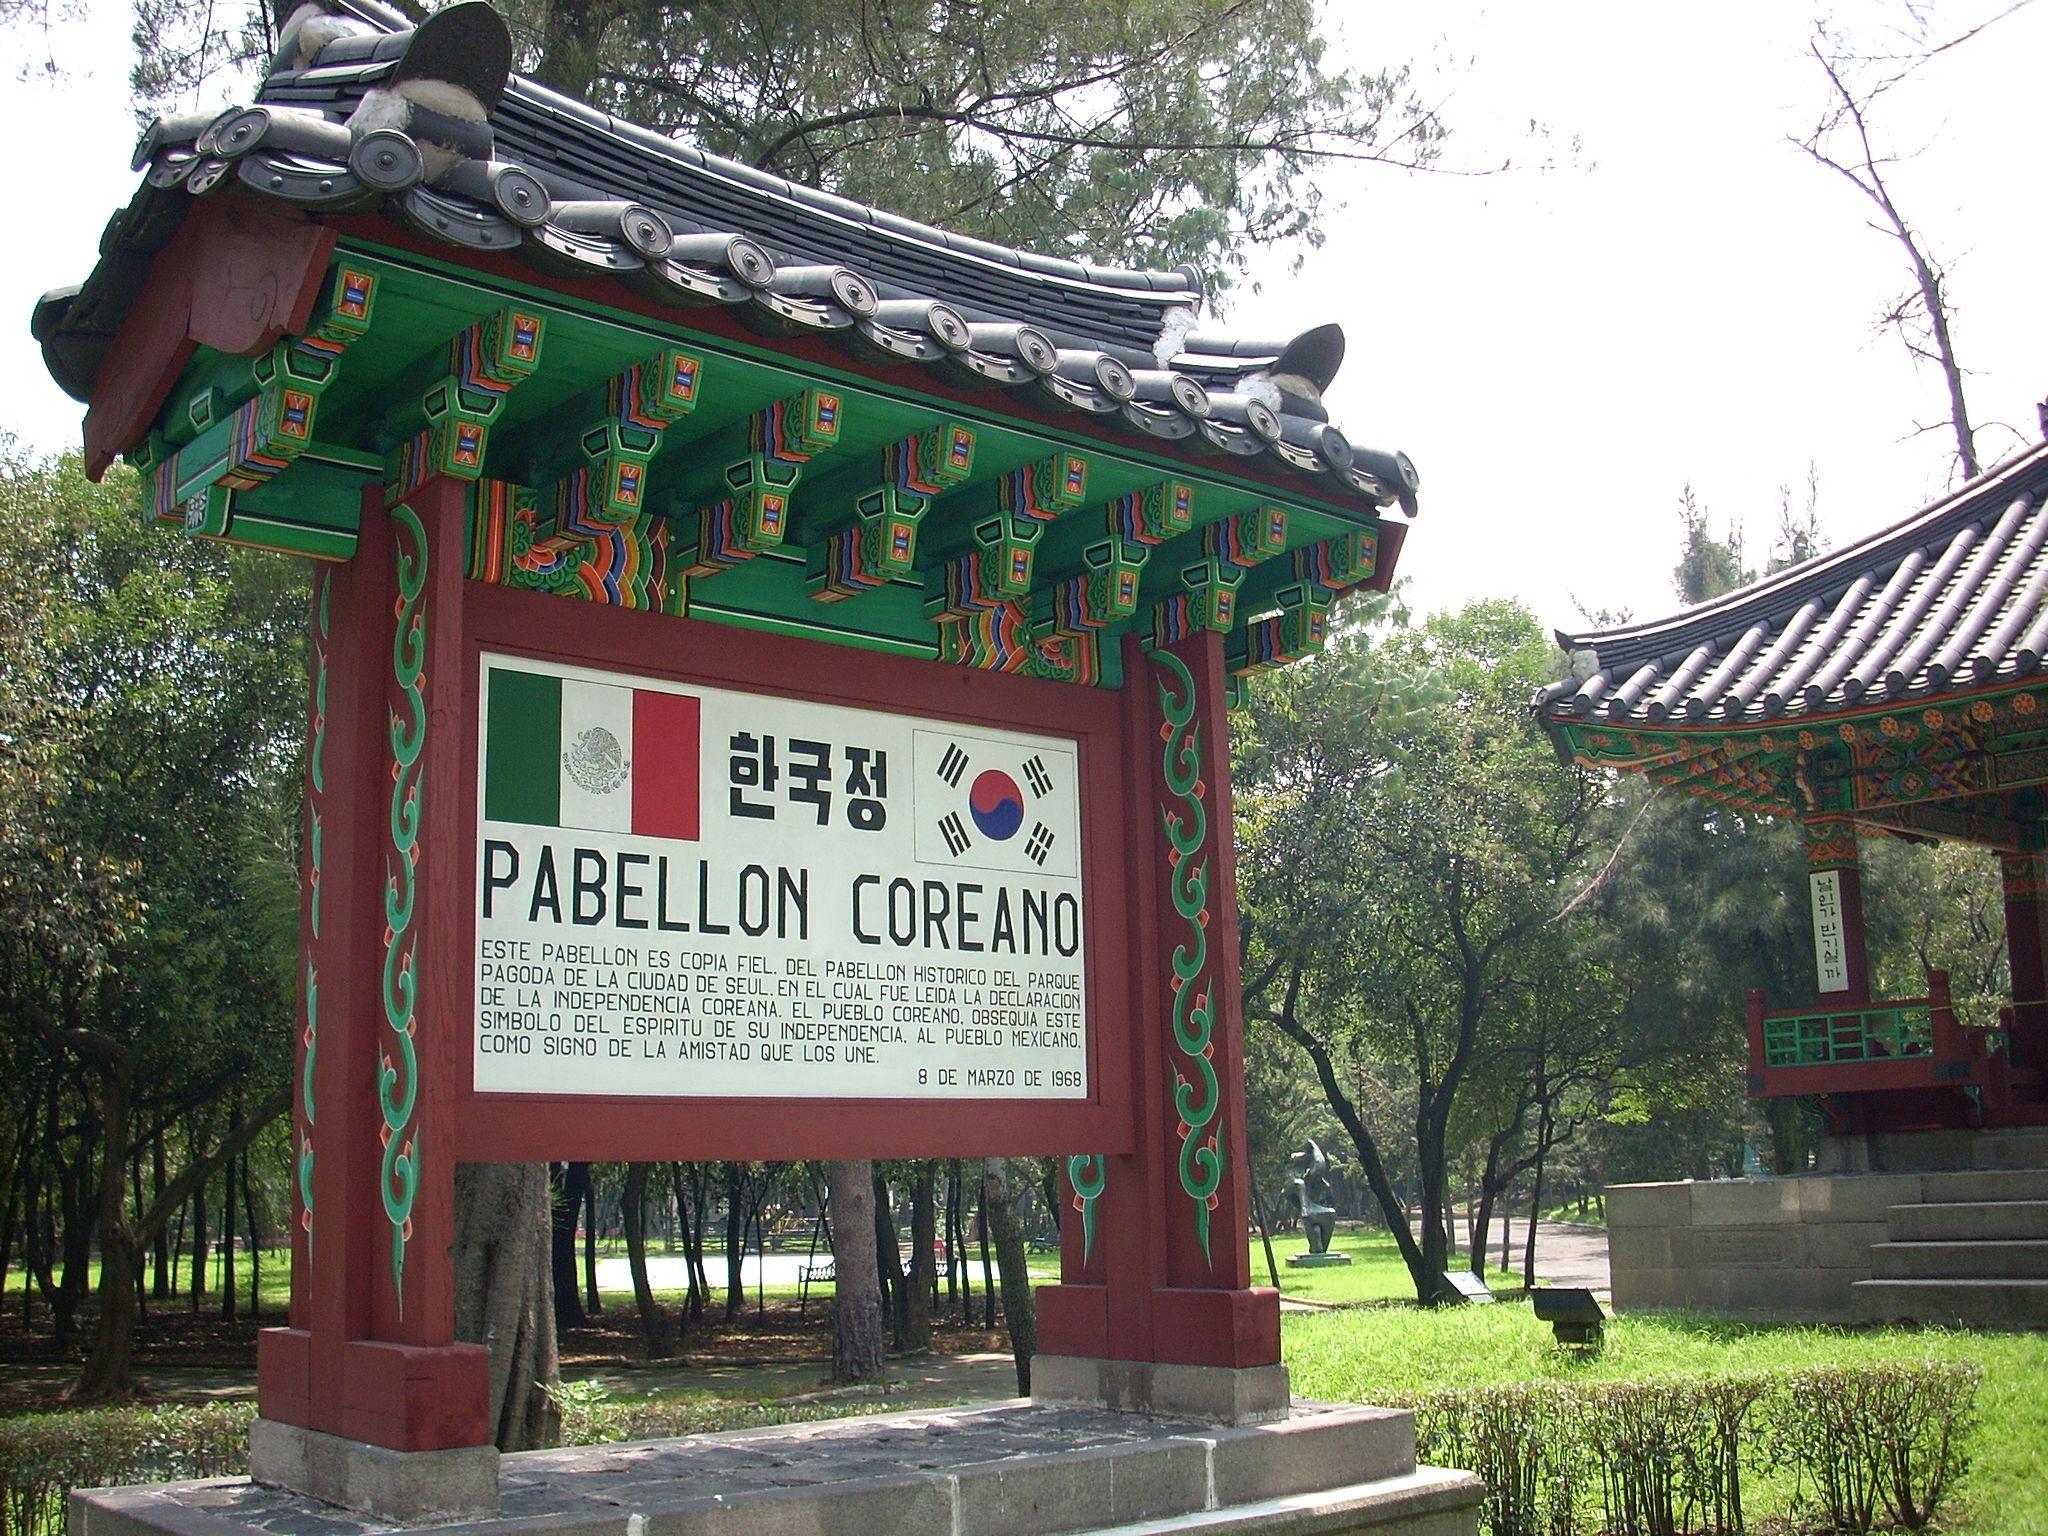 Pabellón Coreano | © Carlos Perez Chavez/WikiCommons